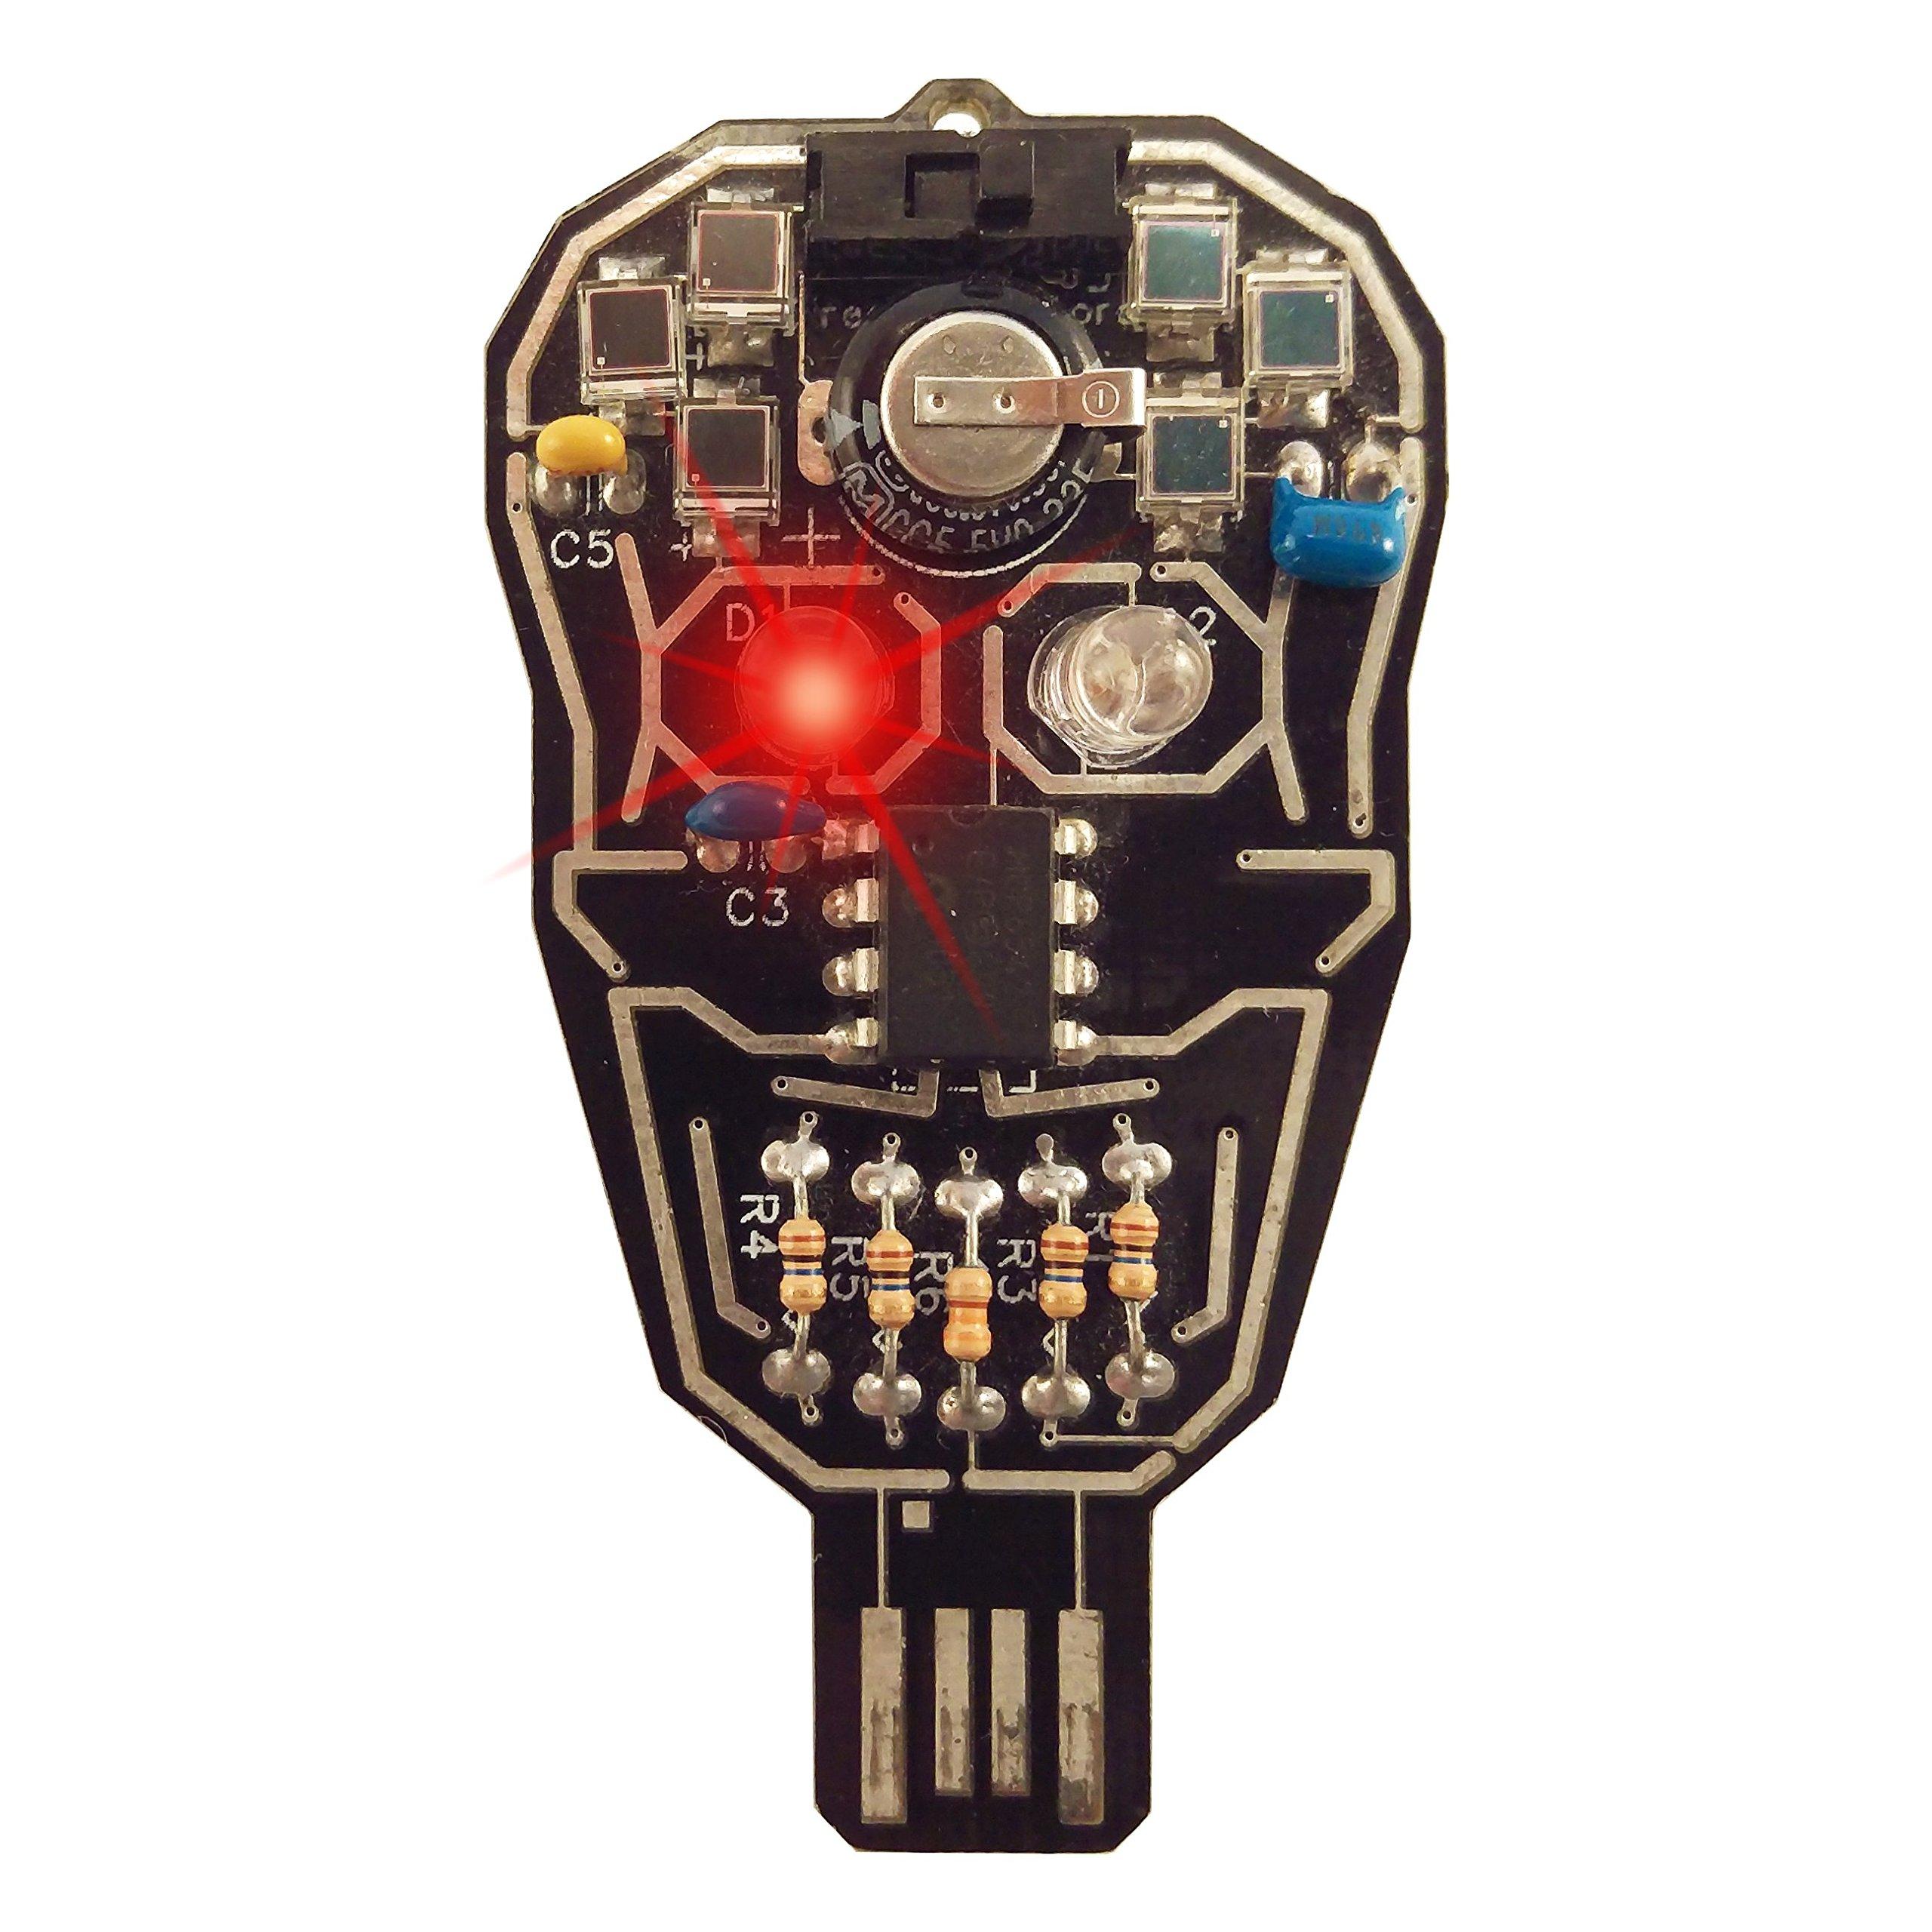 Lumen Electronic Jewelry Intermediate Soldering kit, Solar powered LED Skull